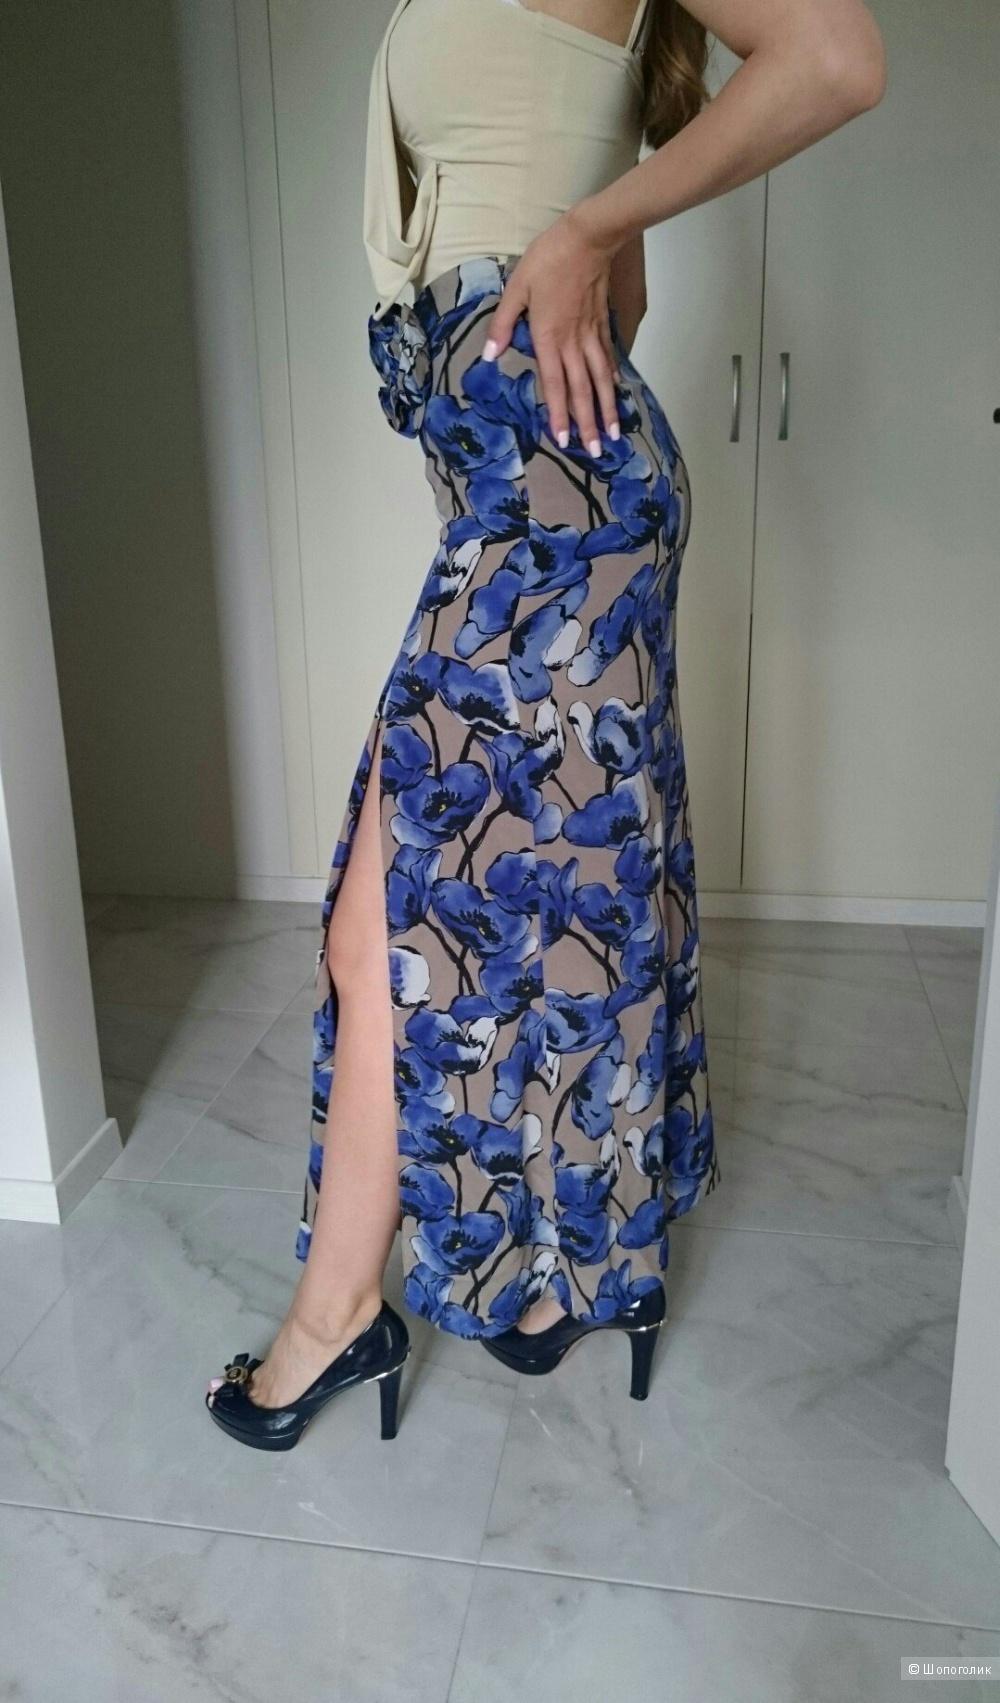 Шелковая юбка Moschino Cheap and Chic Оригинал , размер S